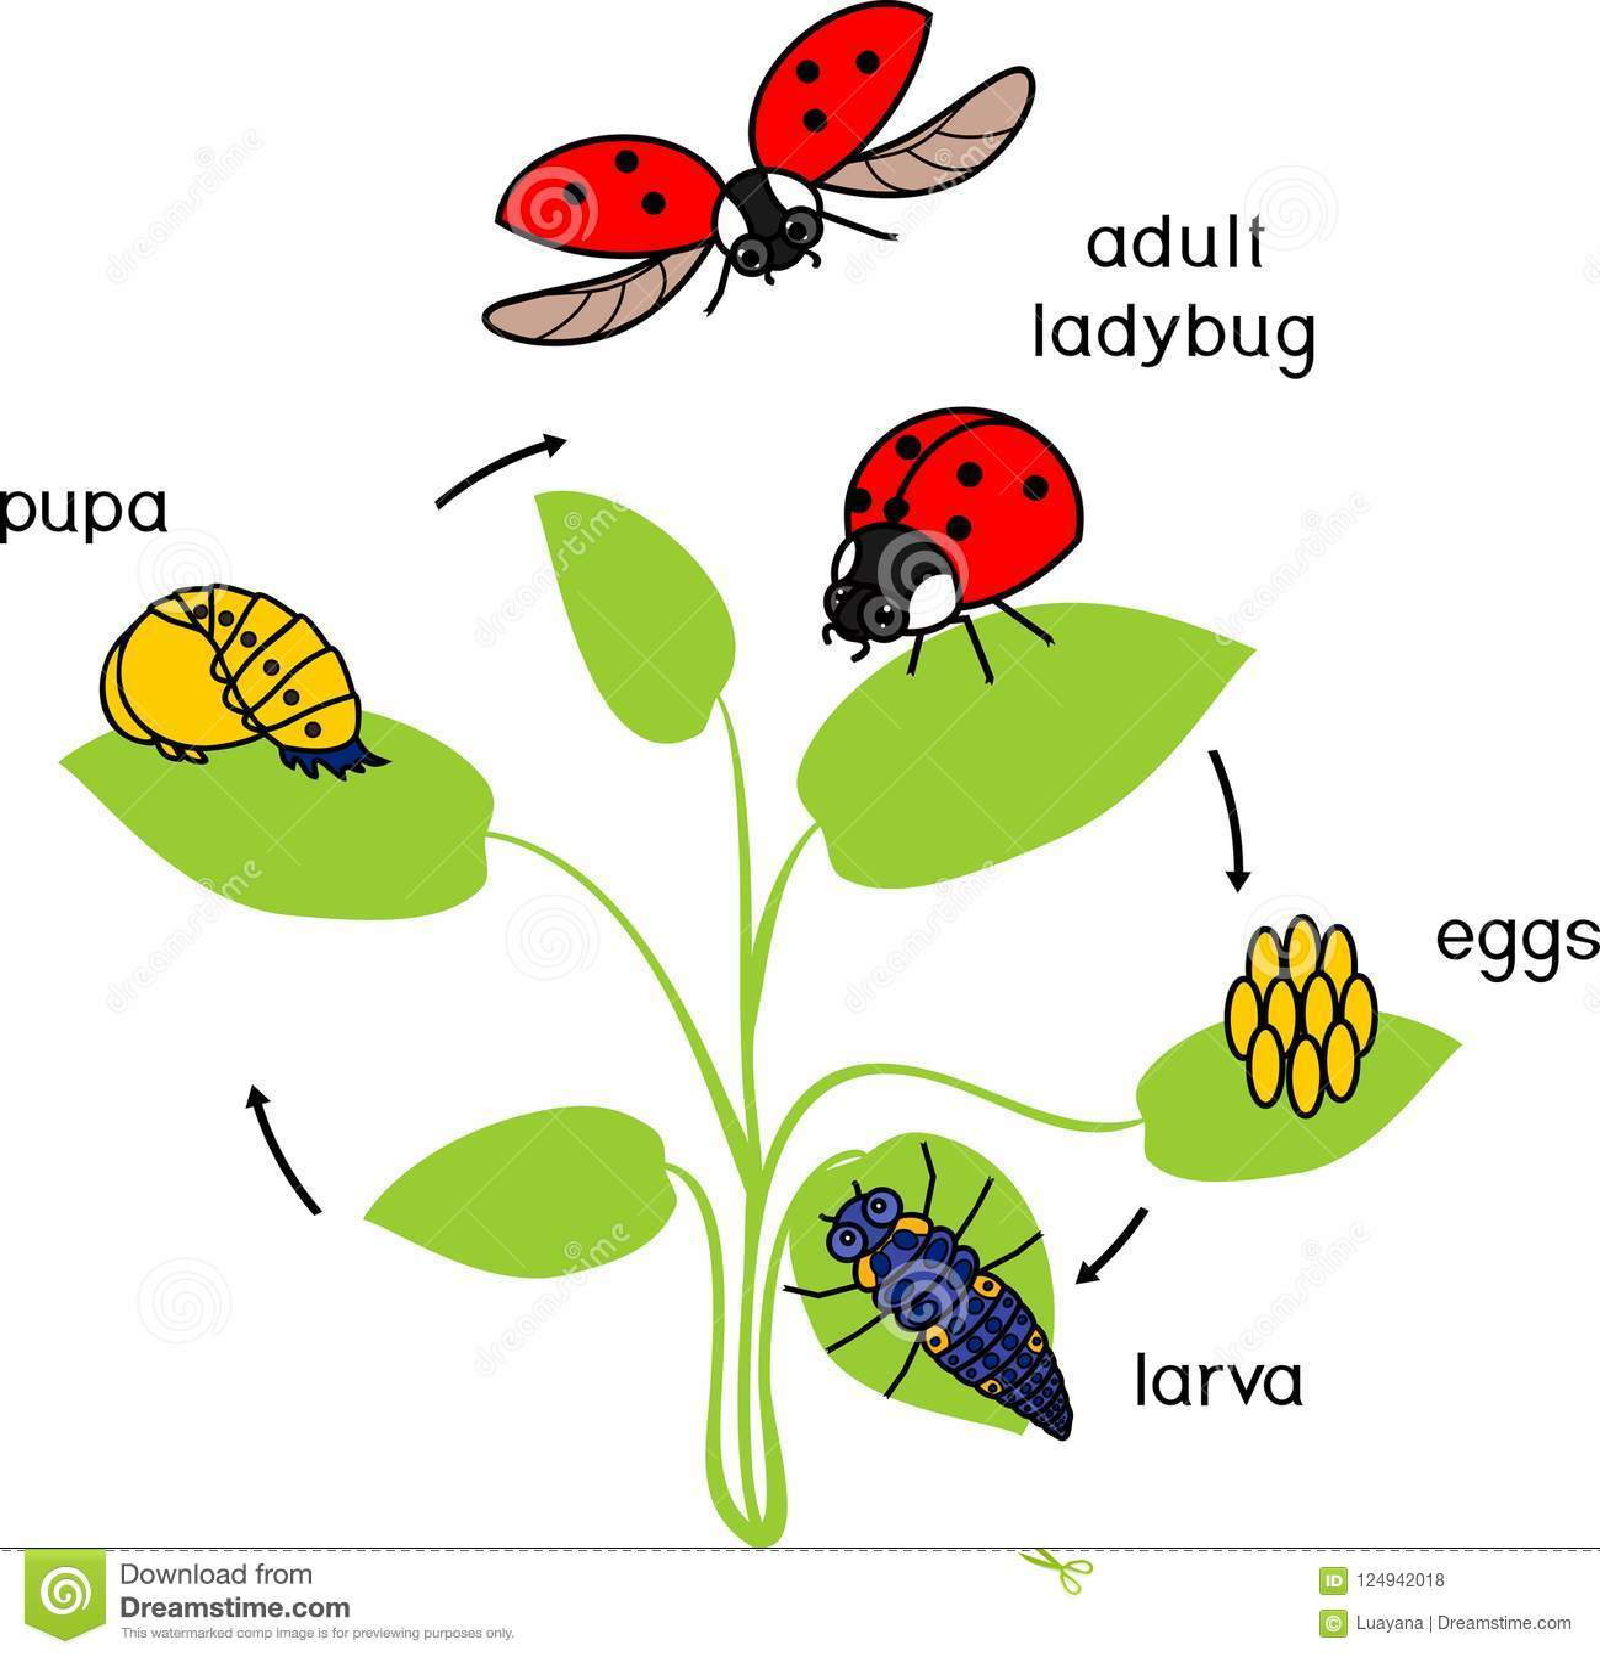 Life Cycle Of Ladybug Stages Of Development Of Ladybug